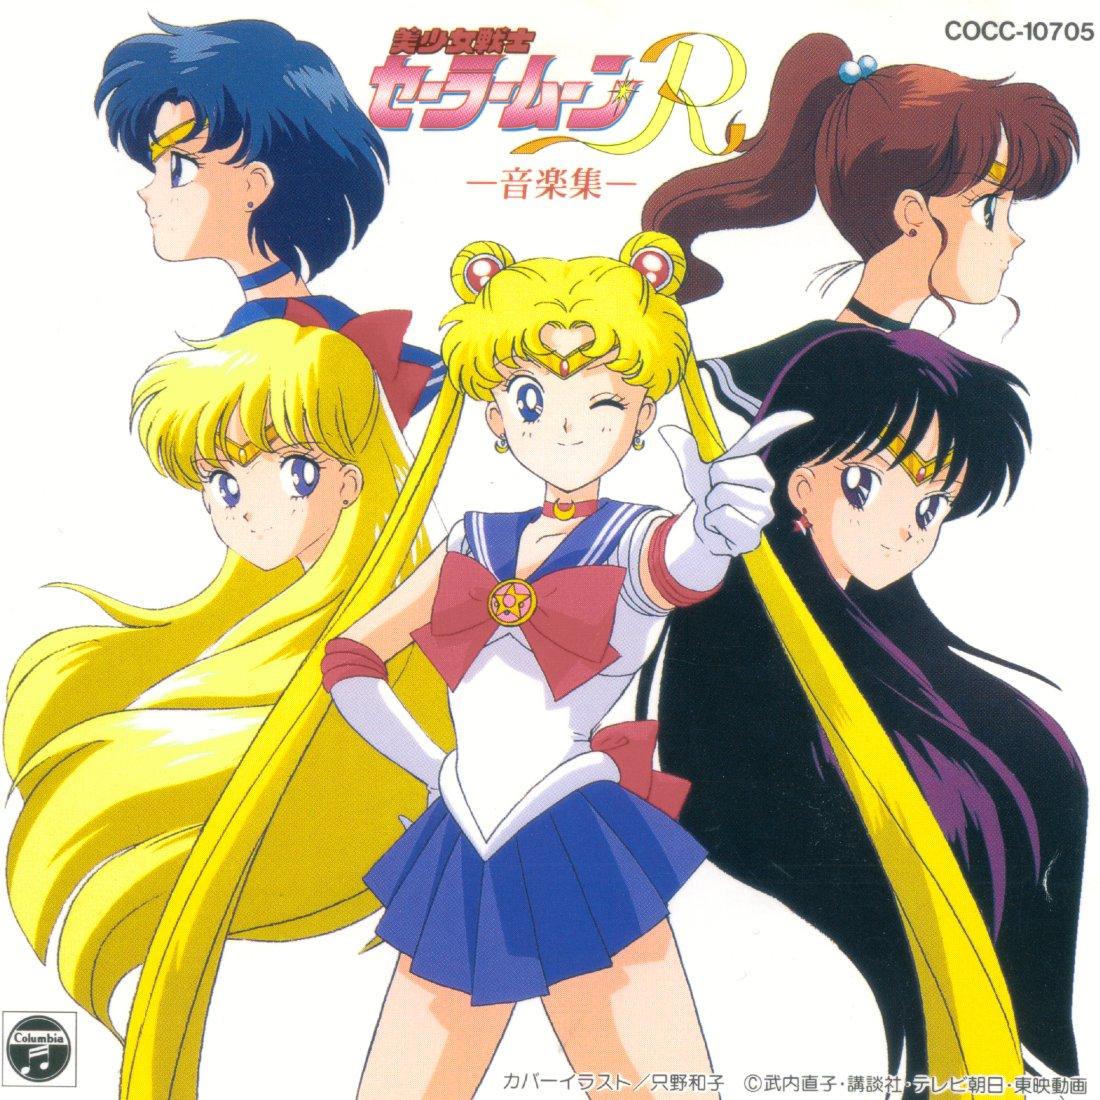 Sailormoon / Ay Sava�c�s� / 1.Sezon / Online Anime Dizi �zle